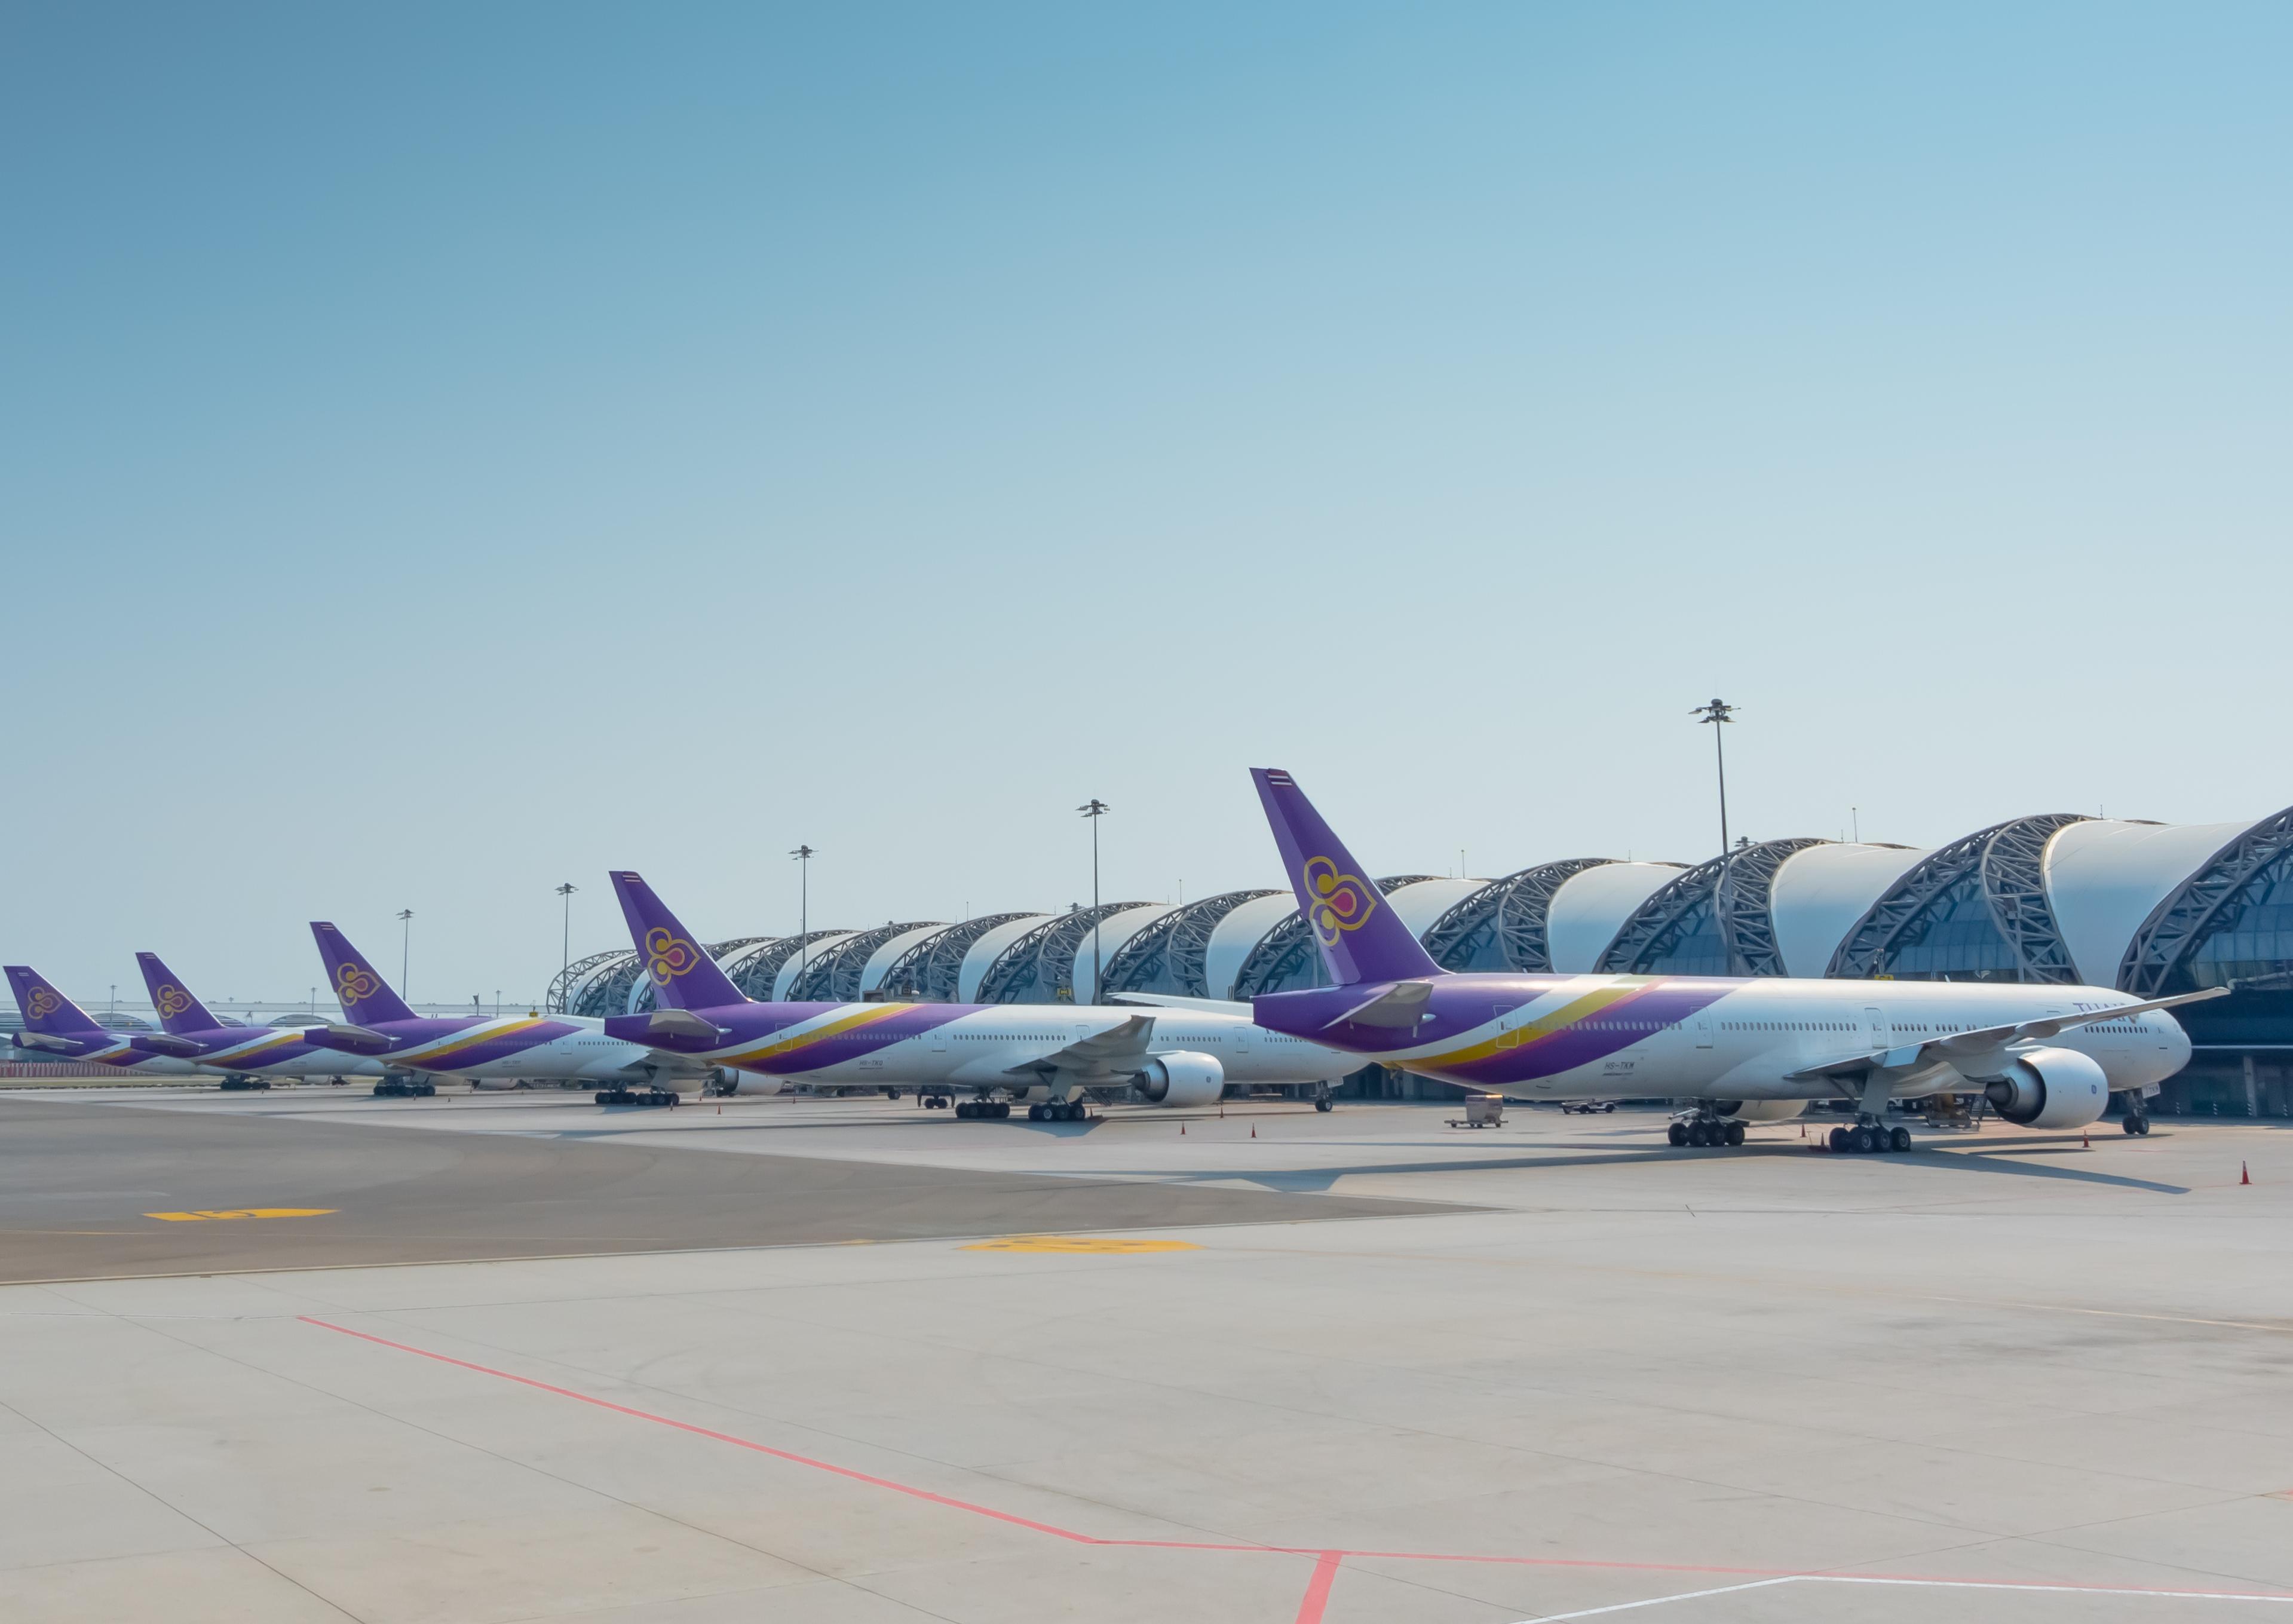 Thai Airways' operating losses deepen in Q3